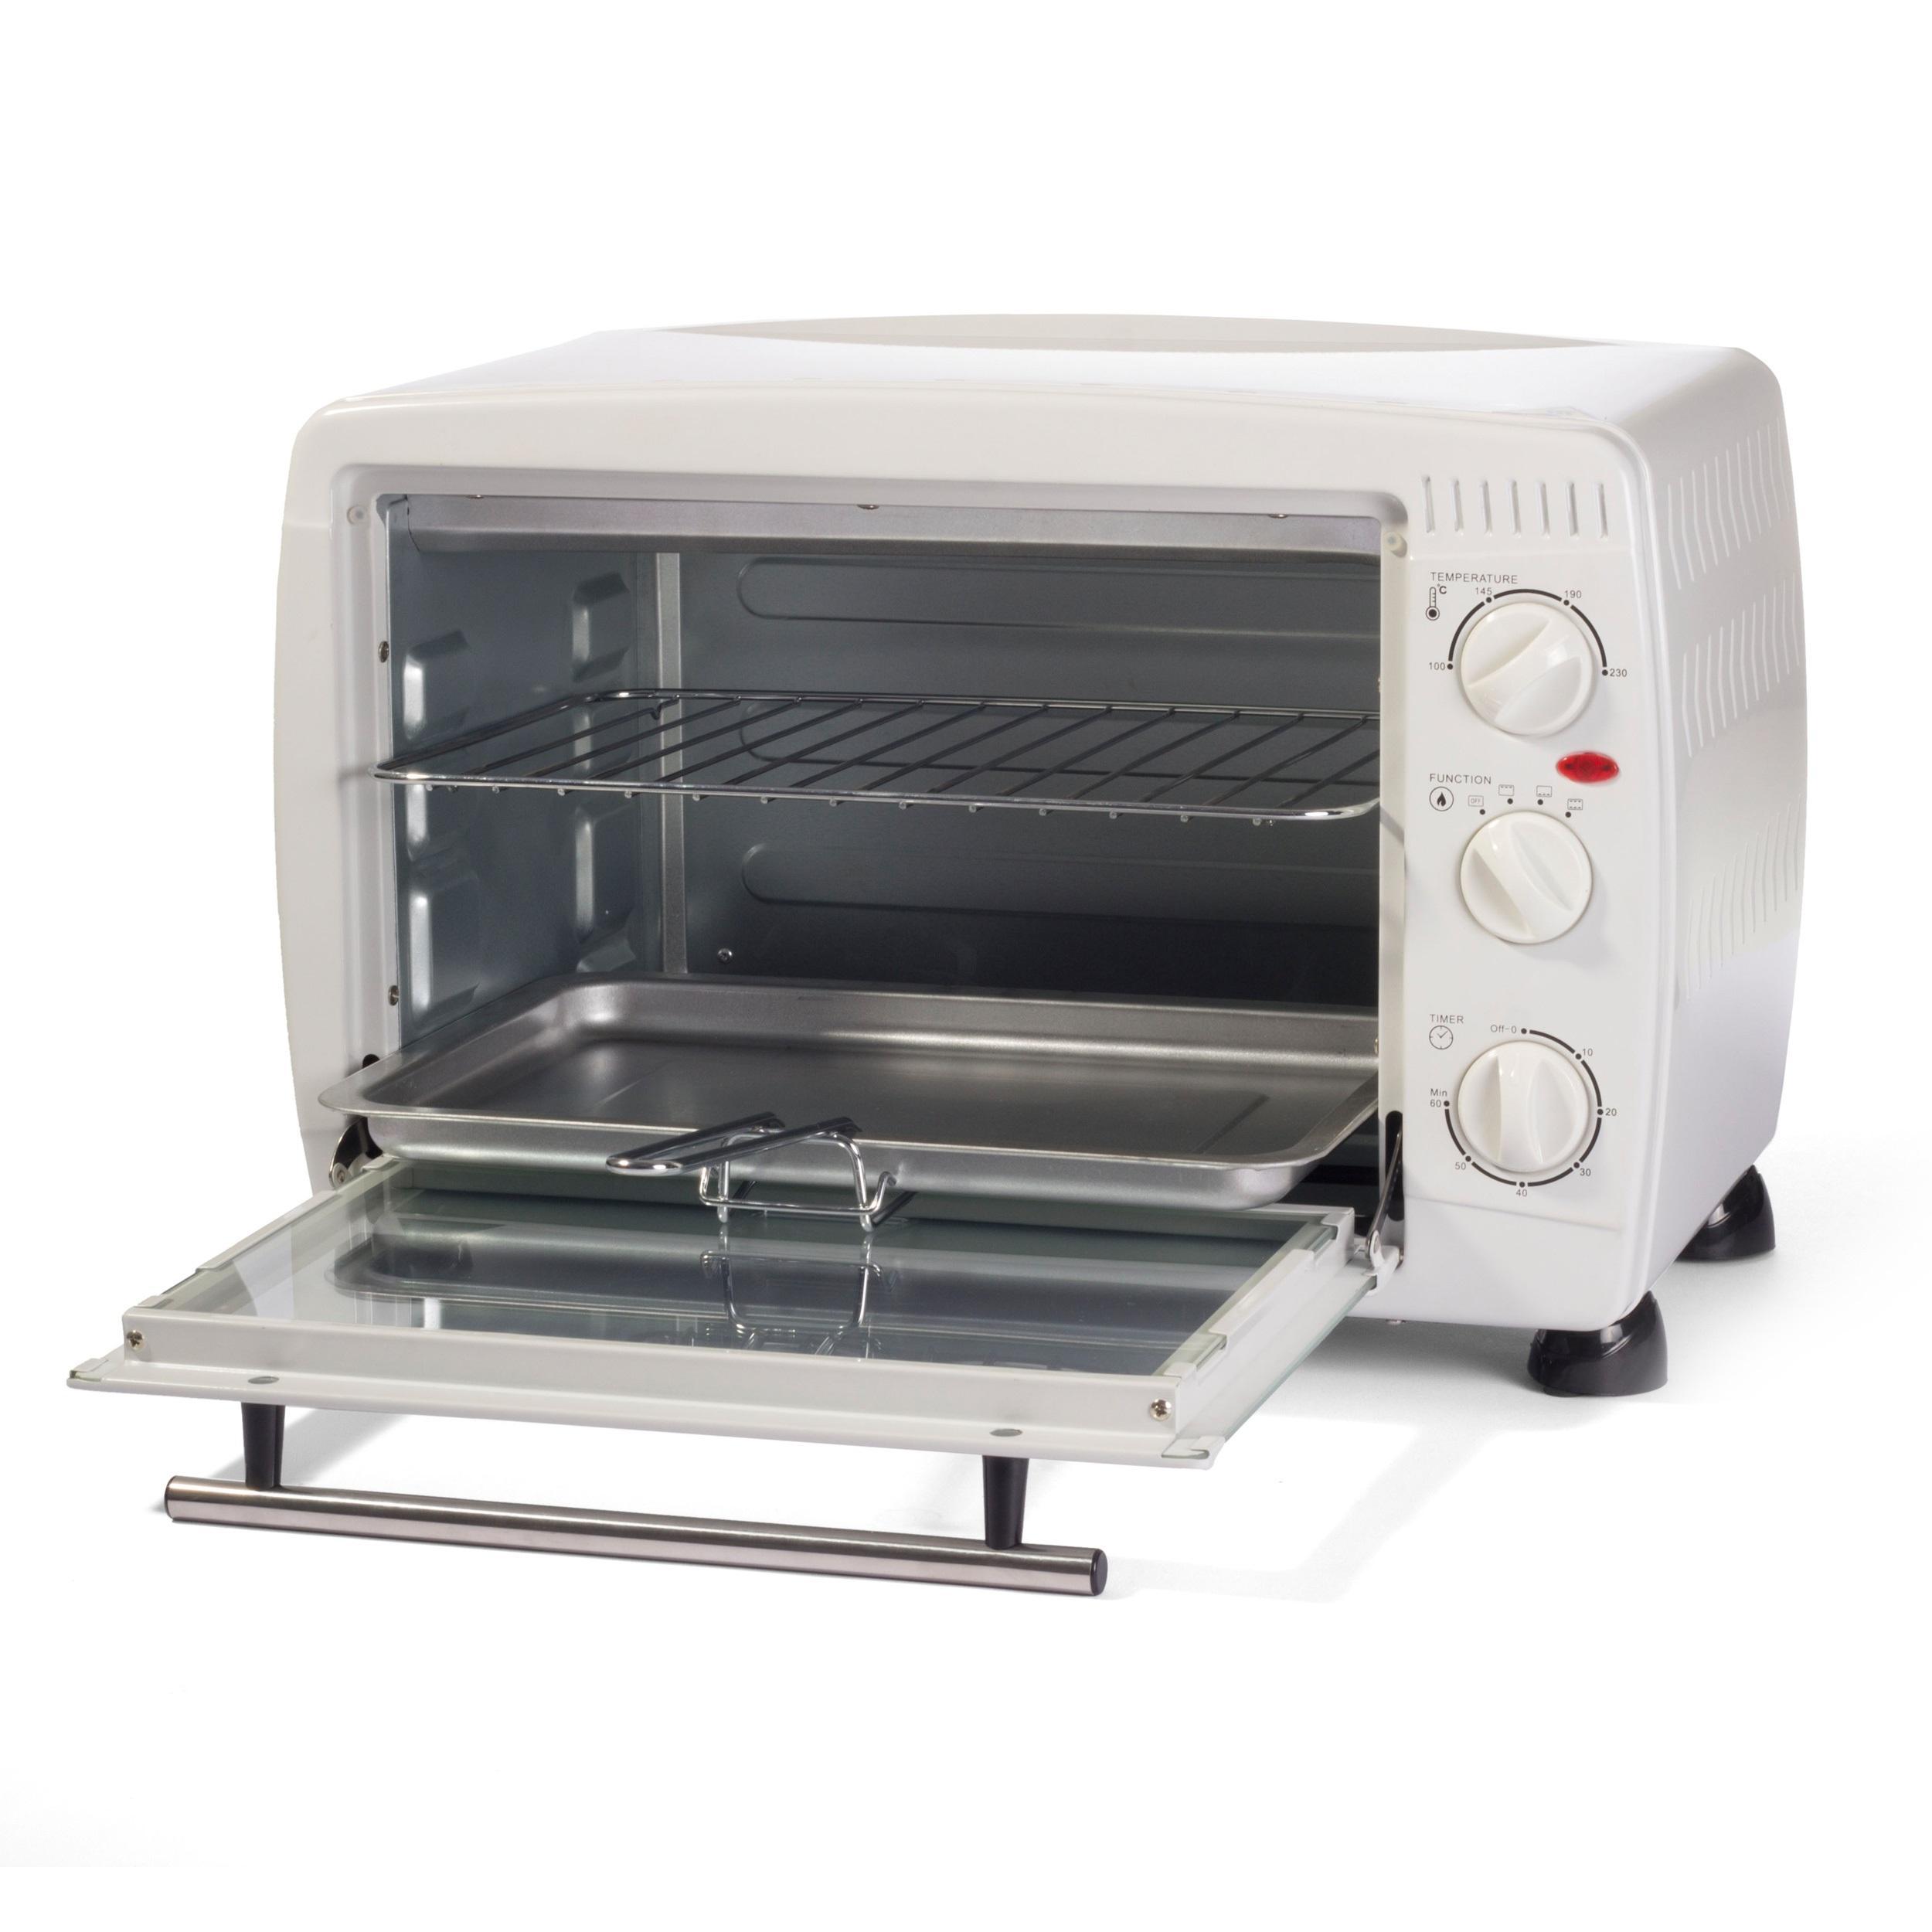 Mini Oven: Igenix IG7127 Mini Oven, 26 L, 1500 W